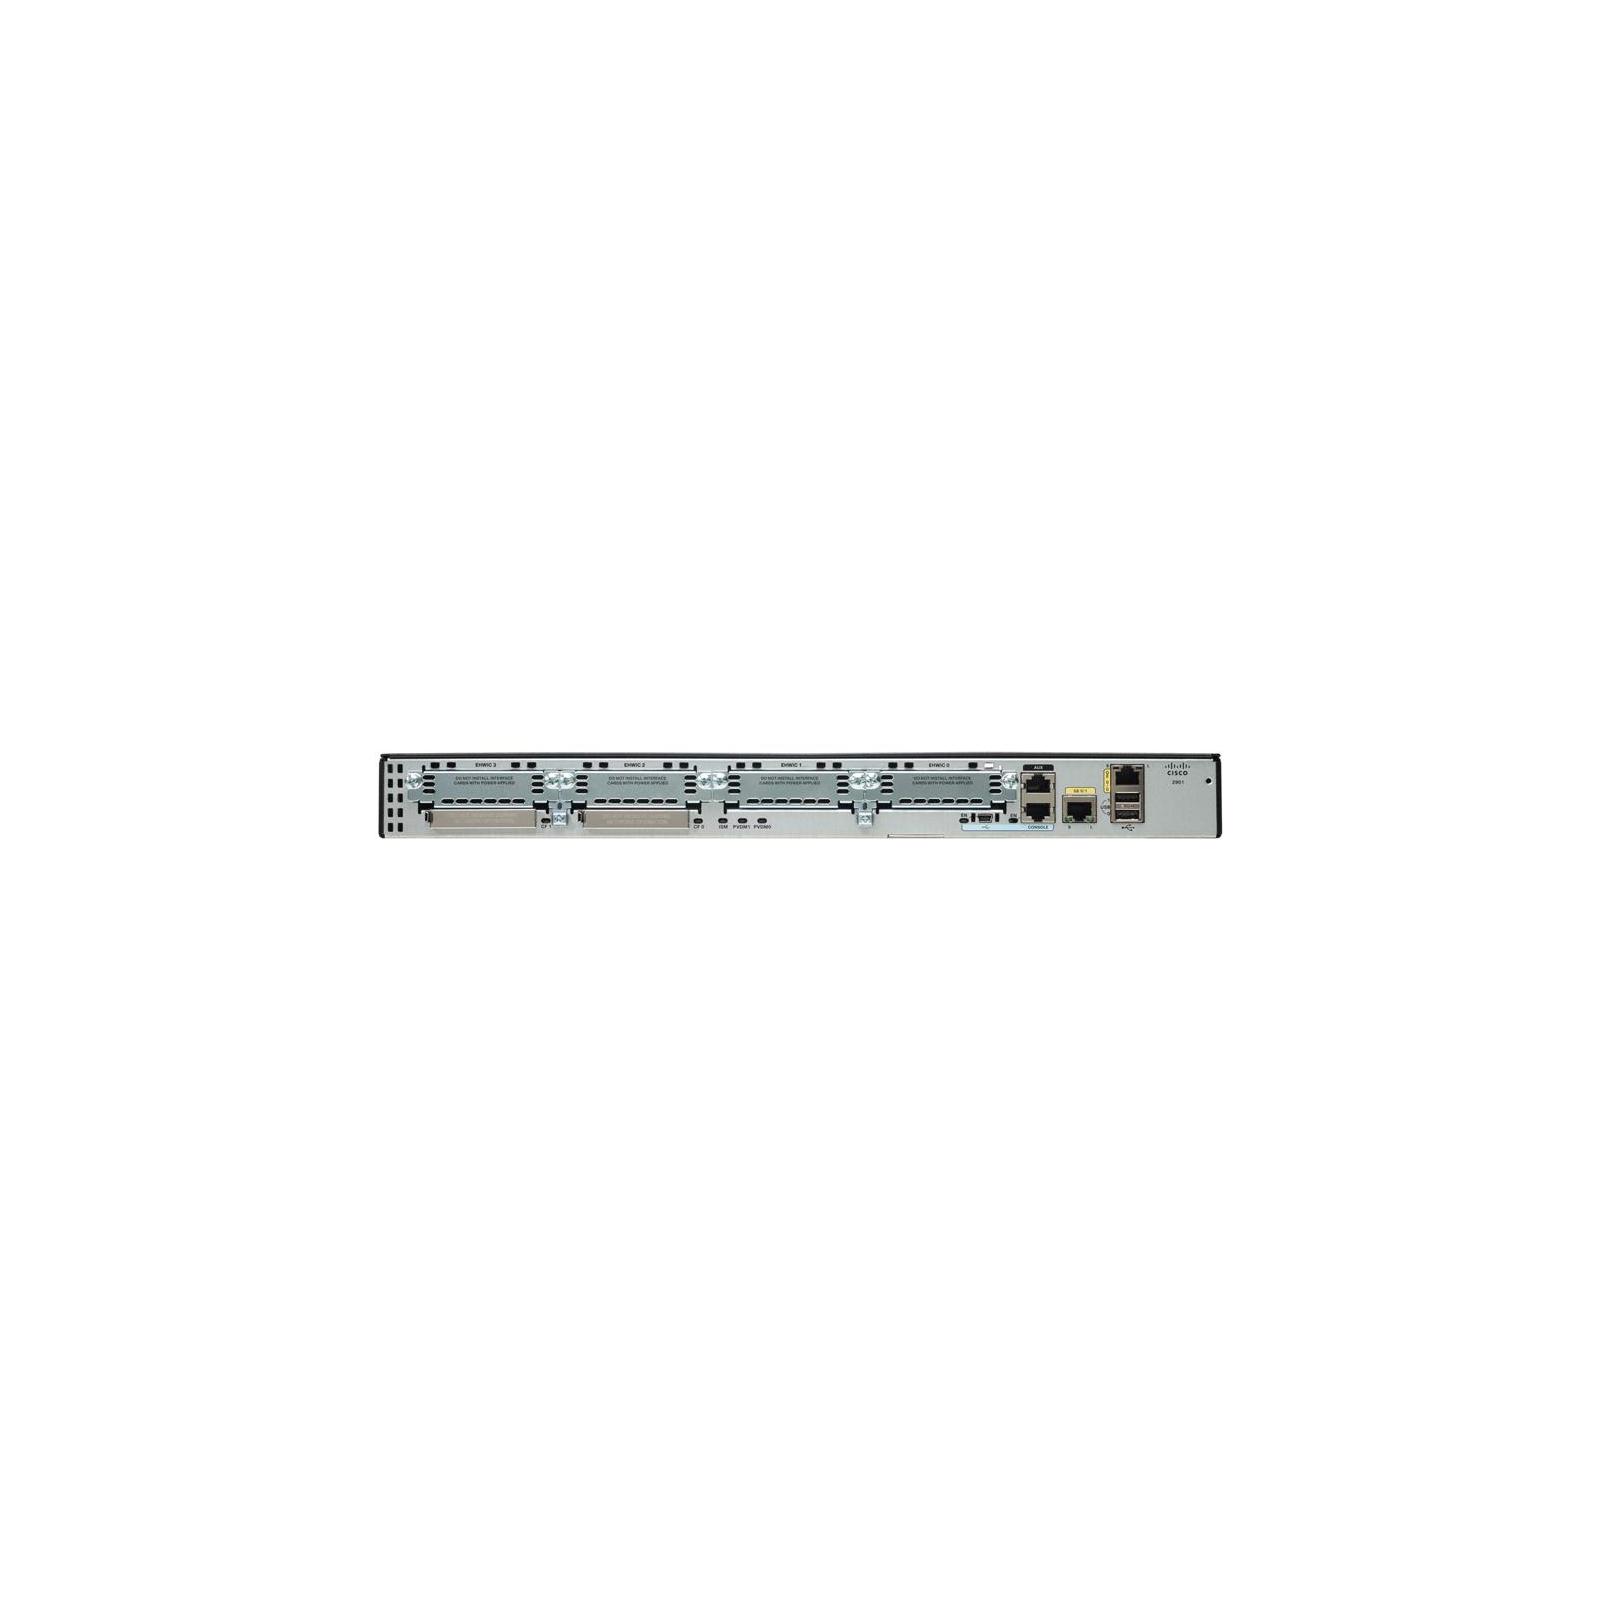 Маршрутизатор Cisco CISCO2901-SEC/K9 изображение 2